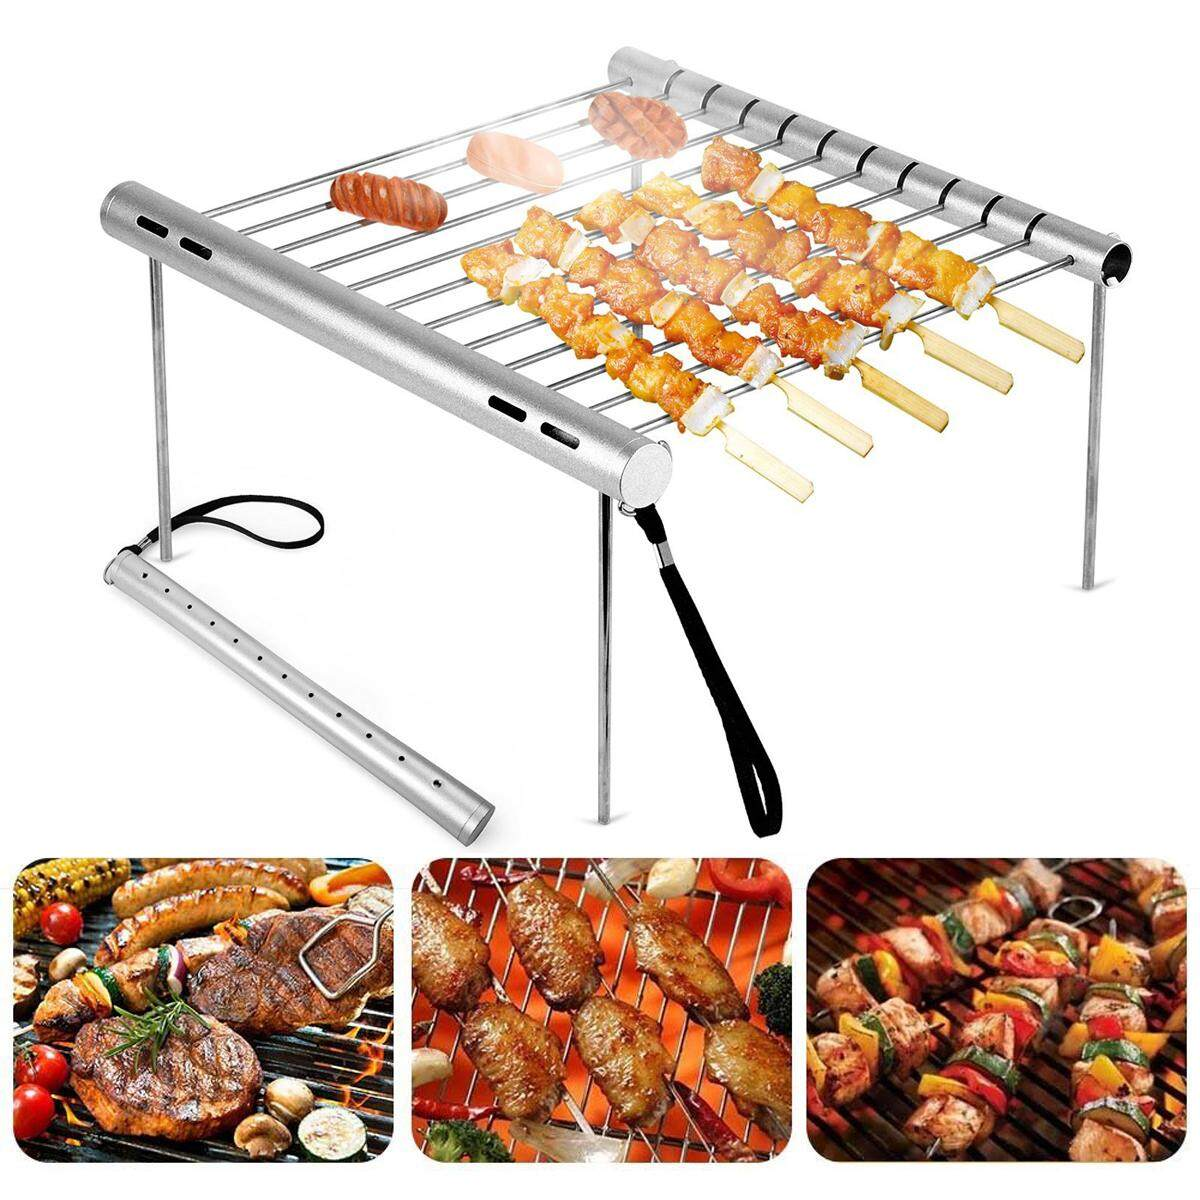 Luar Ruangan Portabel Lipat Baja Anti Karat Panggangan Barbecue Piknik Bbq Alat Kemah-Intl By Threegold.